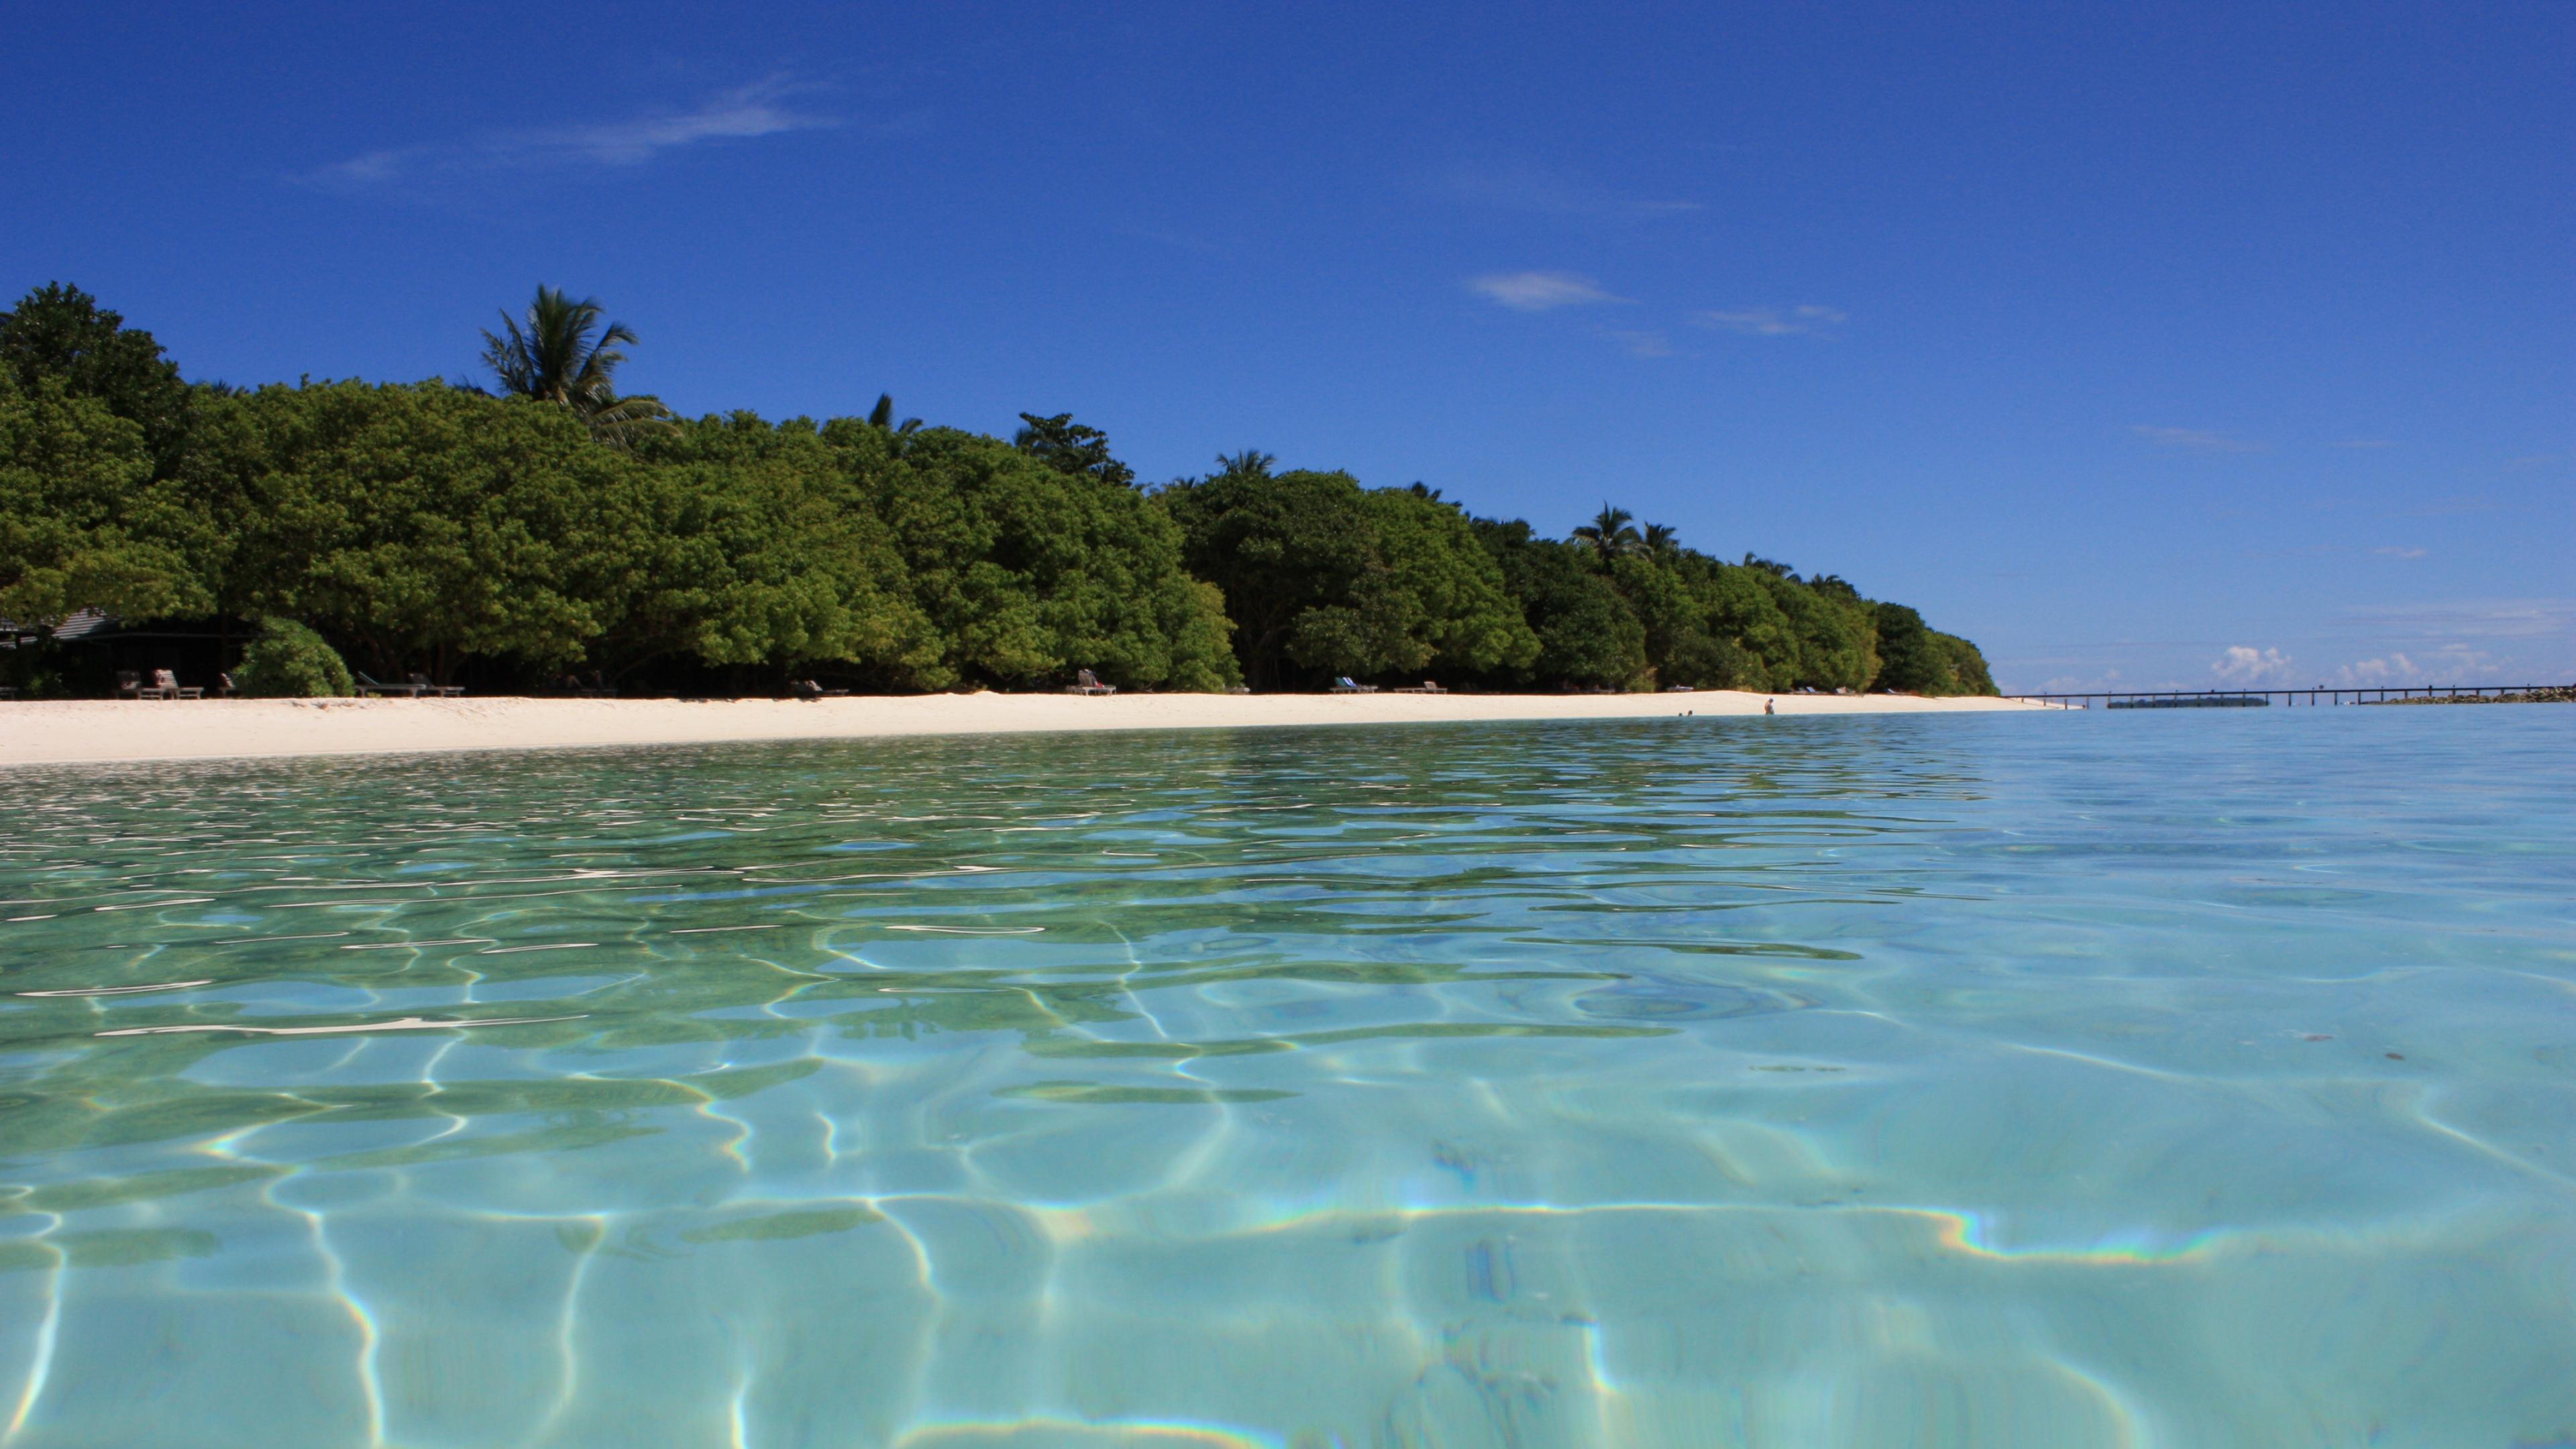 Maldives Sea Summer Beach Wallpaper Background 4K Ultra HD 3840x2160